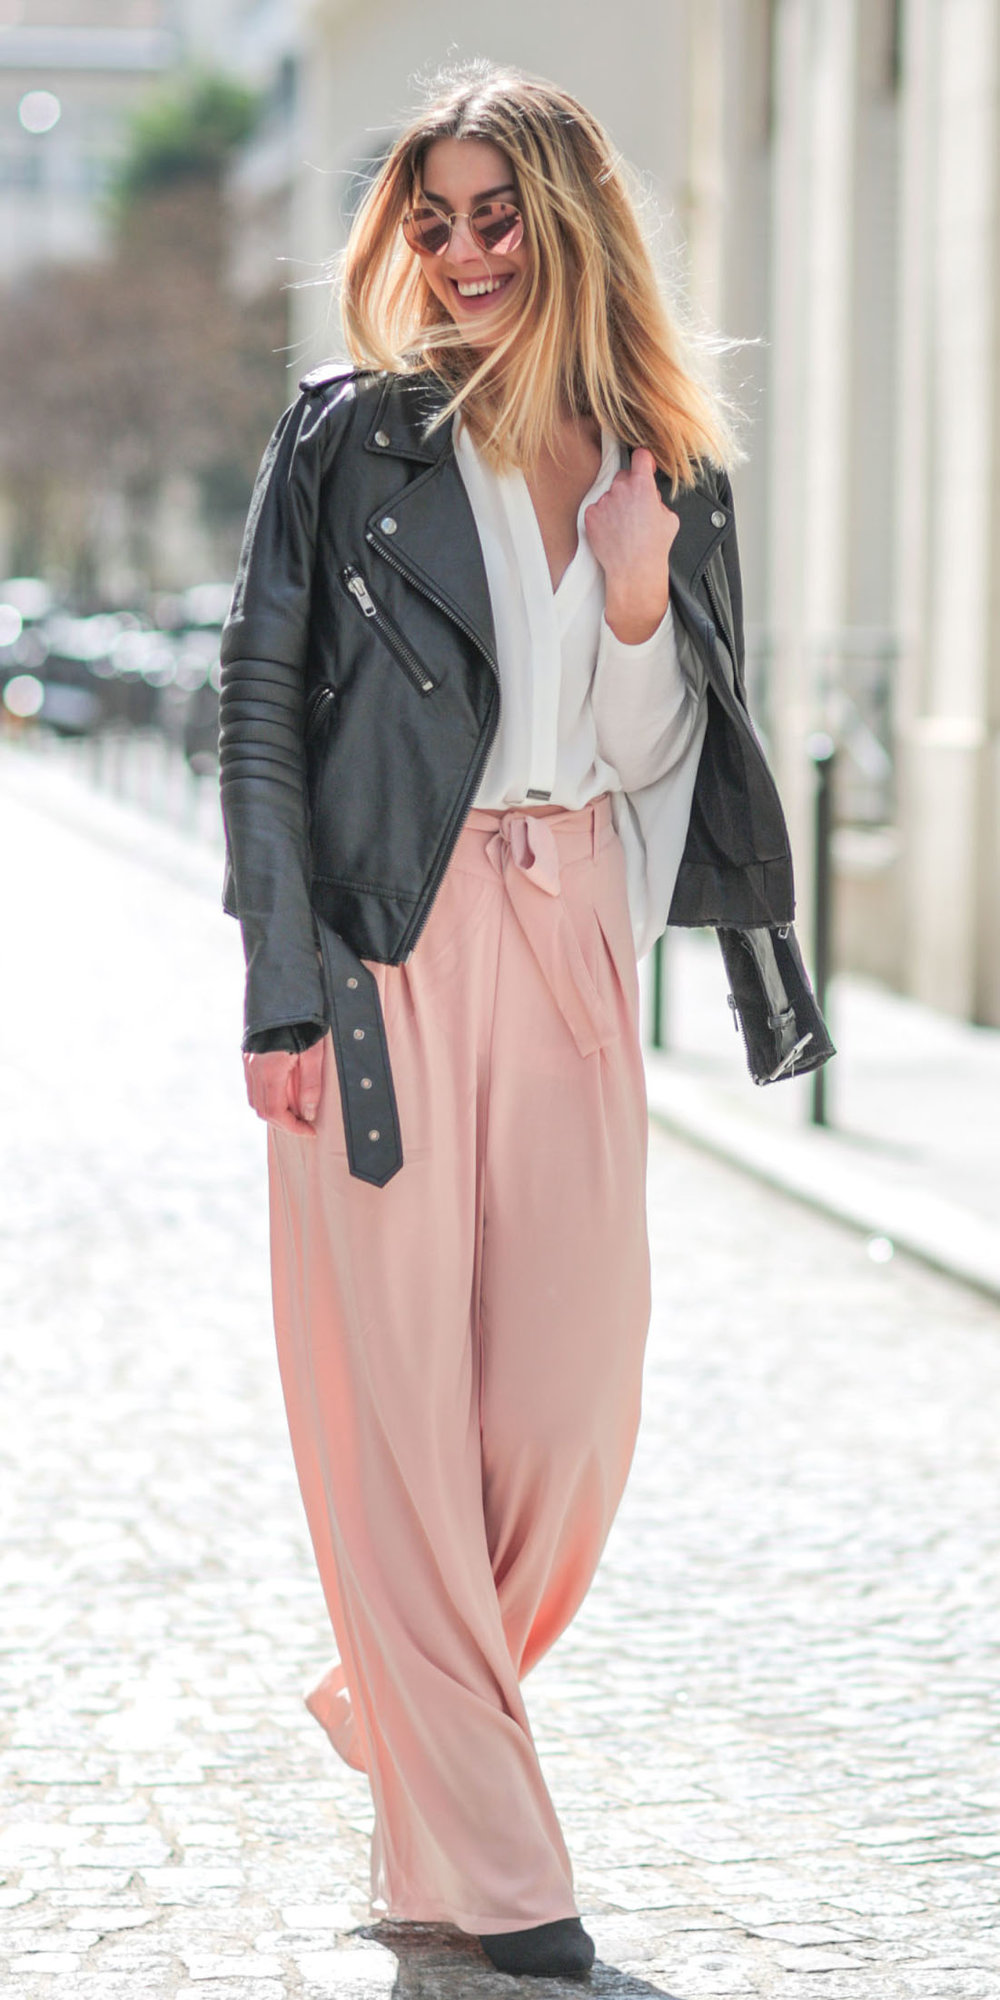 pink-light-wideleg-pants-white-top-blouse-sun-black-jacket-moto-fall-winter-blonde-lunch.jpg